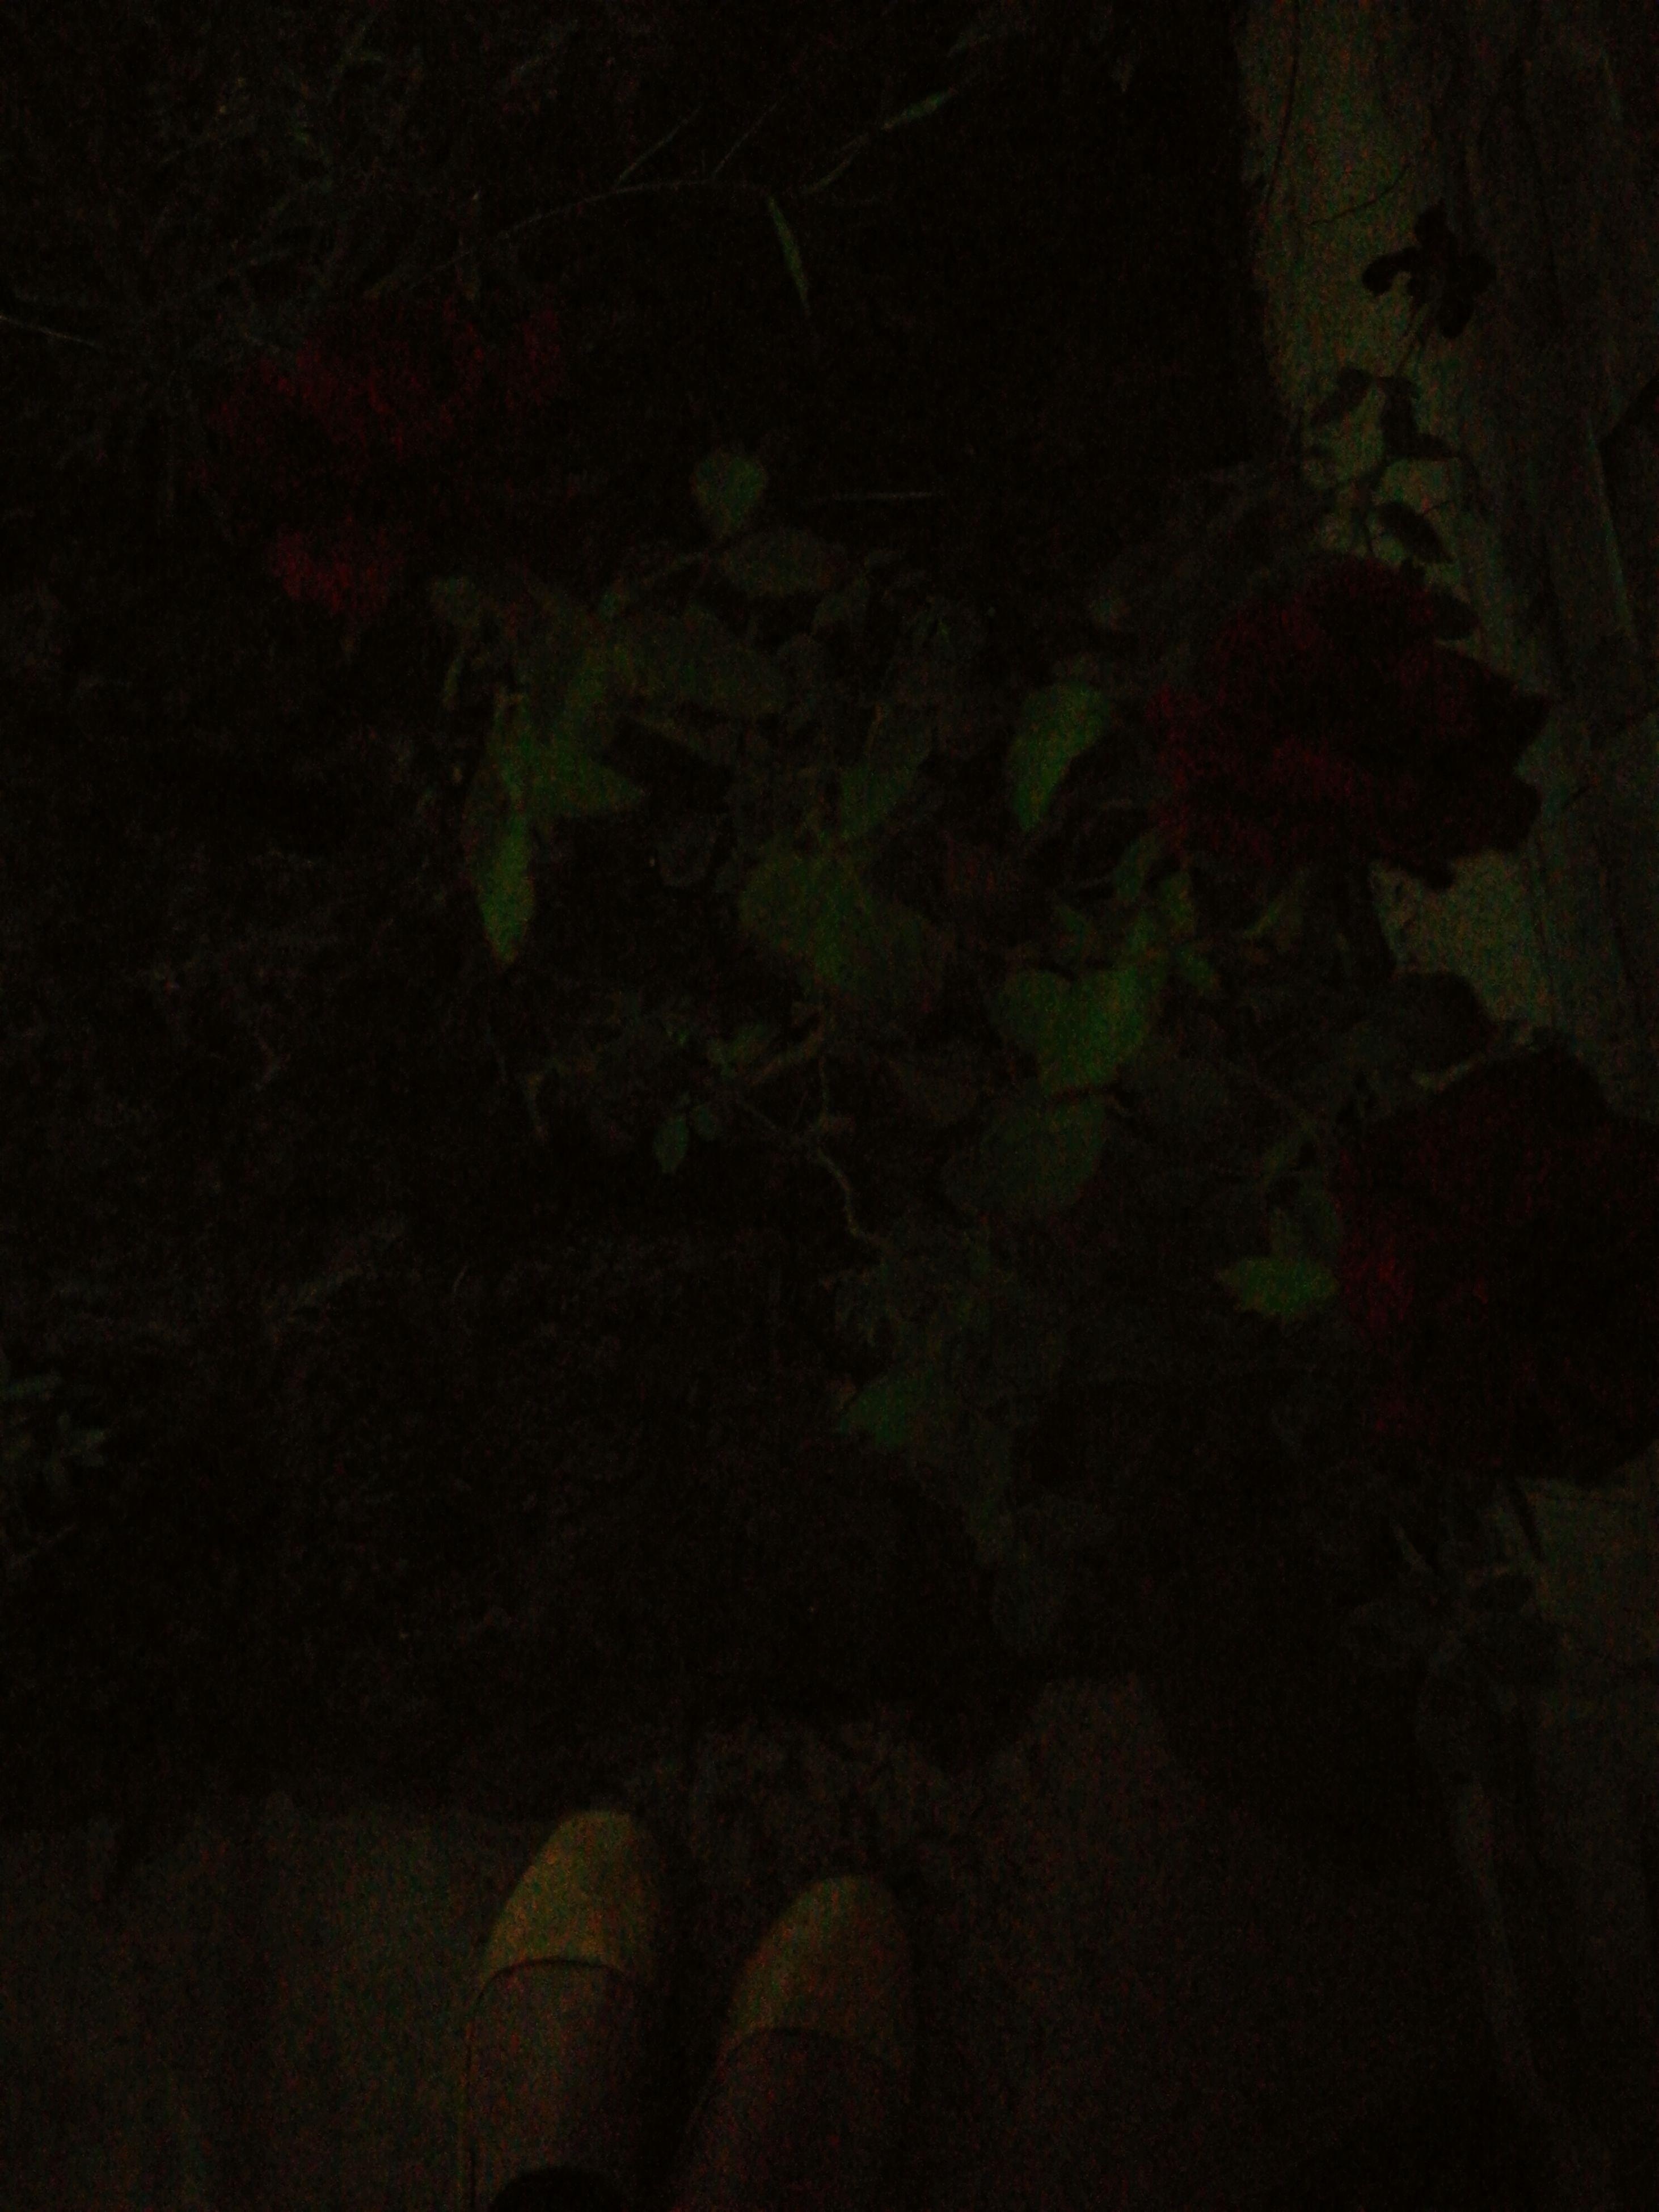 dark, night, darkroom, black background, person, studio shot, darkness, green, green color, outline, focus on shadow